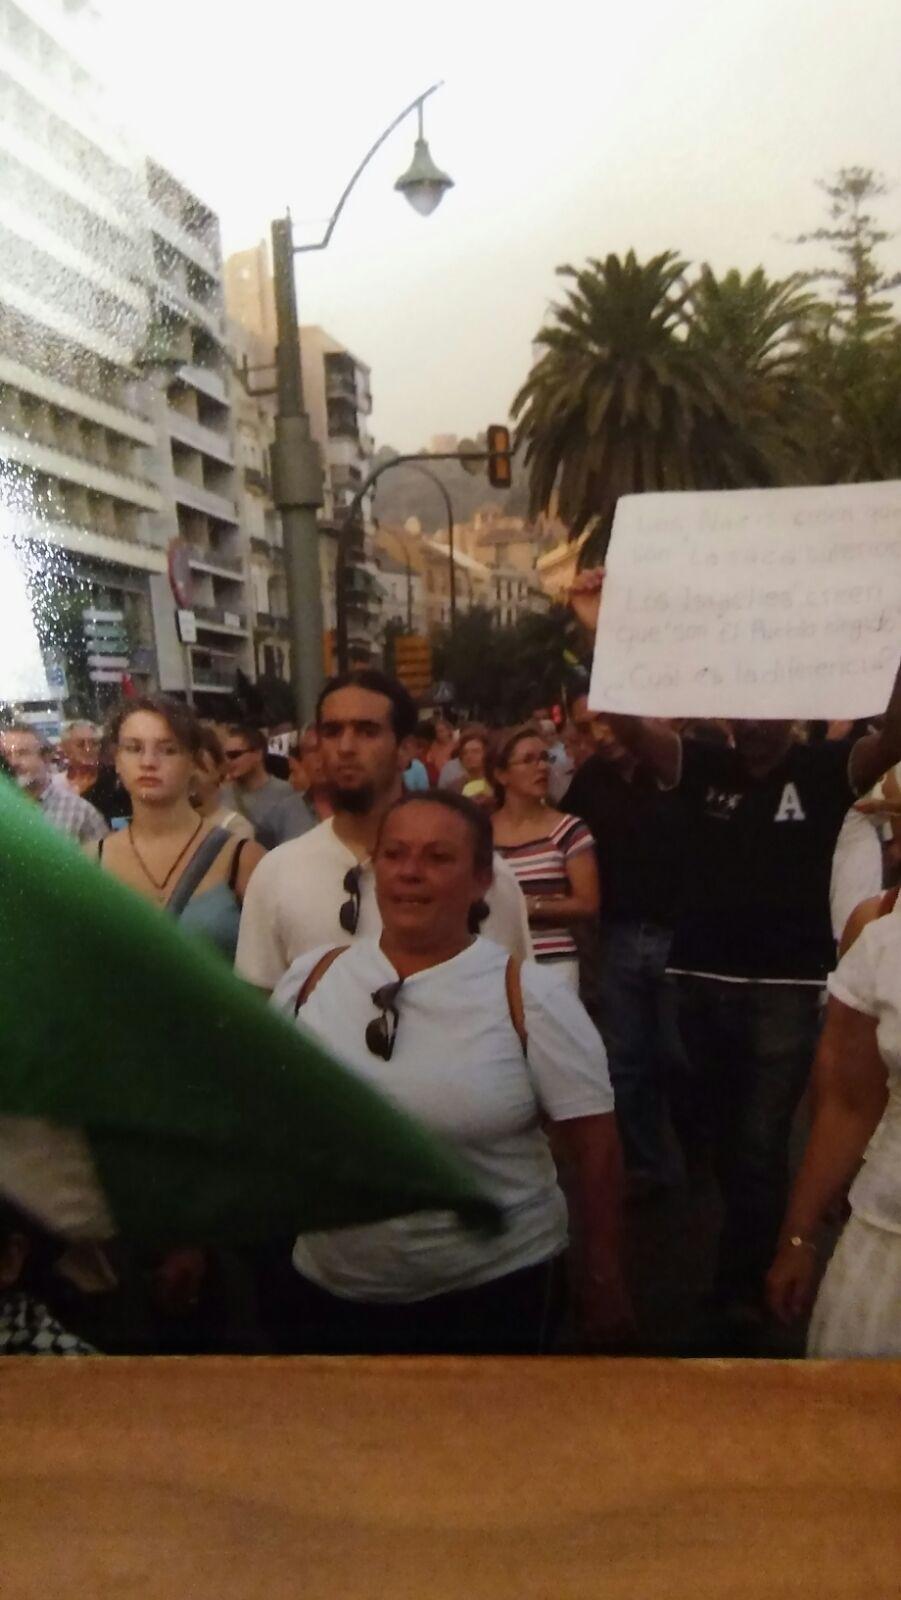 Homenaje-de-CCOO-de-Makro-a-Lola-Vicente-de-Makro-Málaga-manifestacion